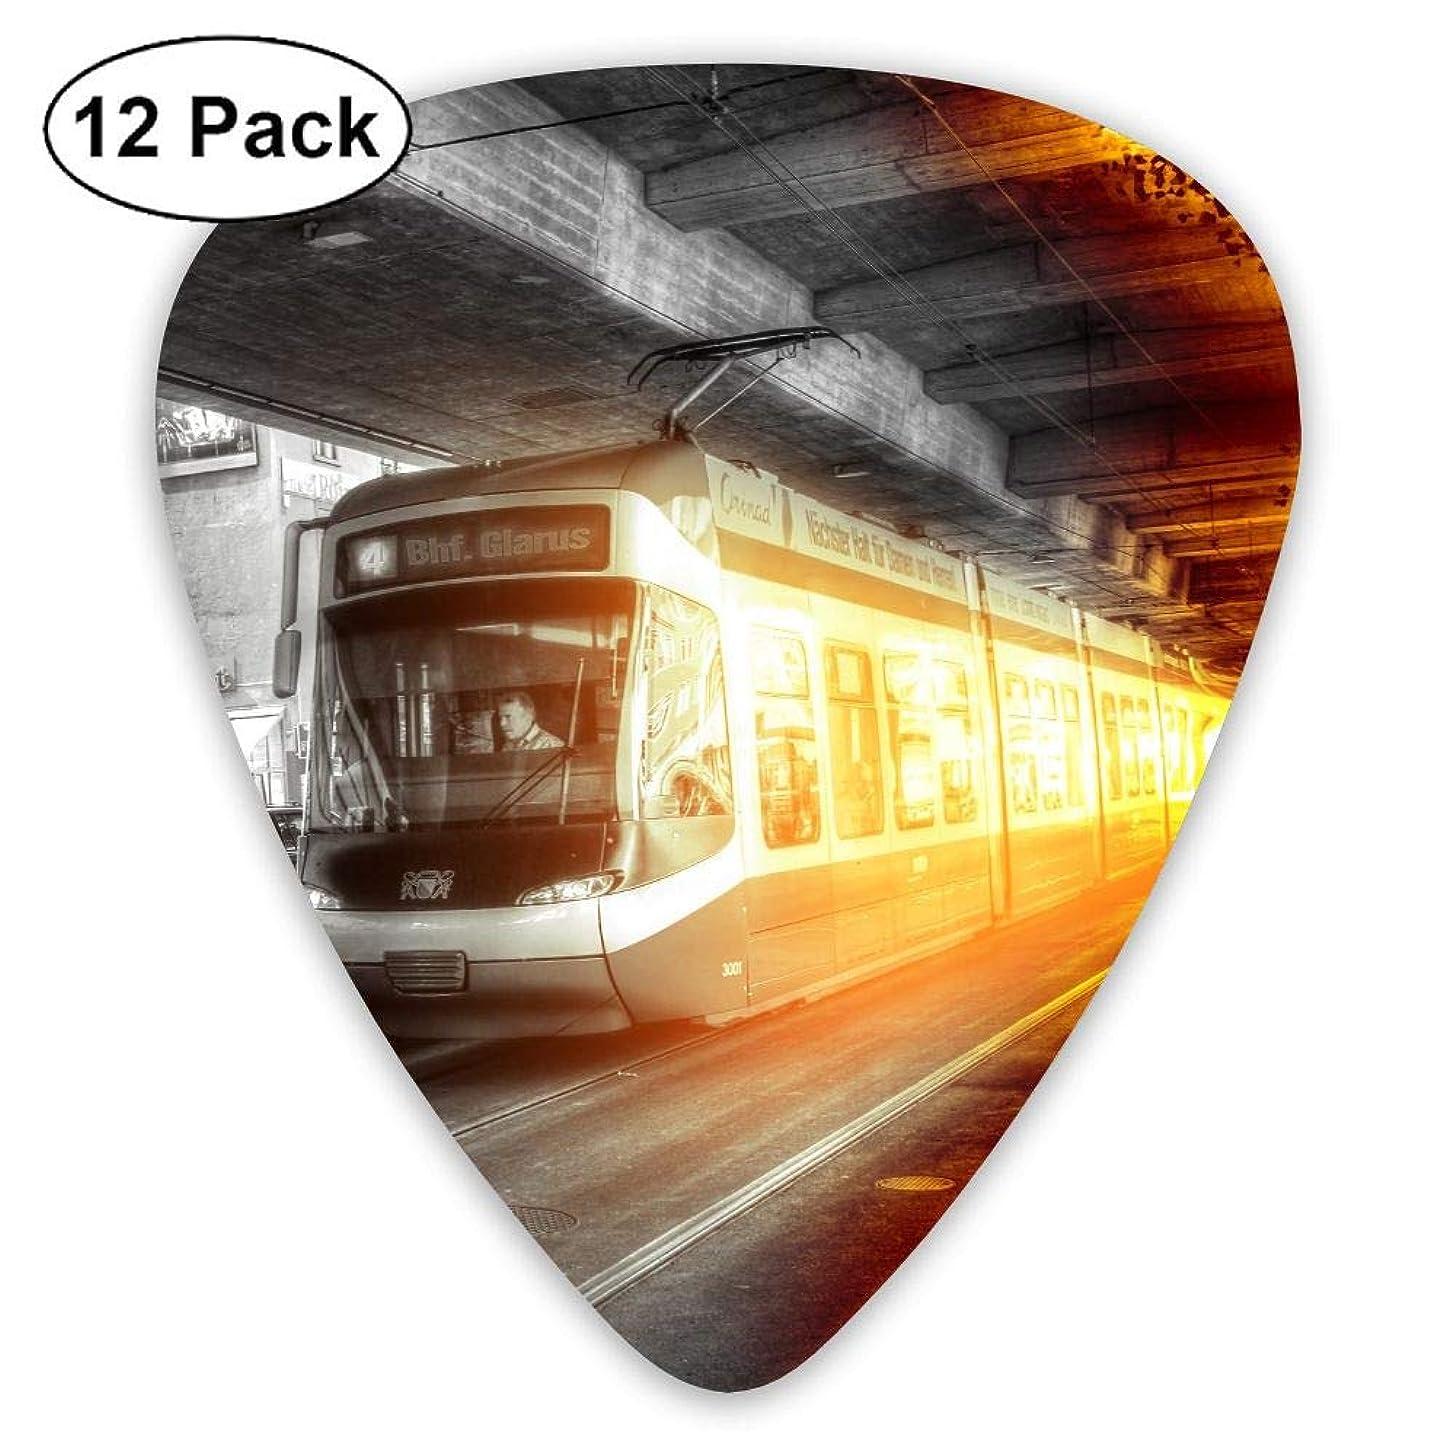 12-pack Fashion Classic Electric Guitar Picks Plectrums Train Station Instrument Standard Bass Guitarist